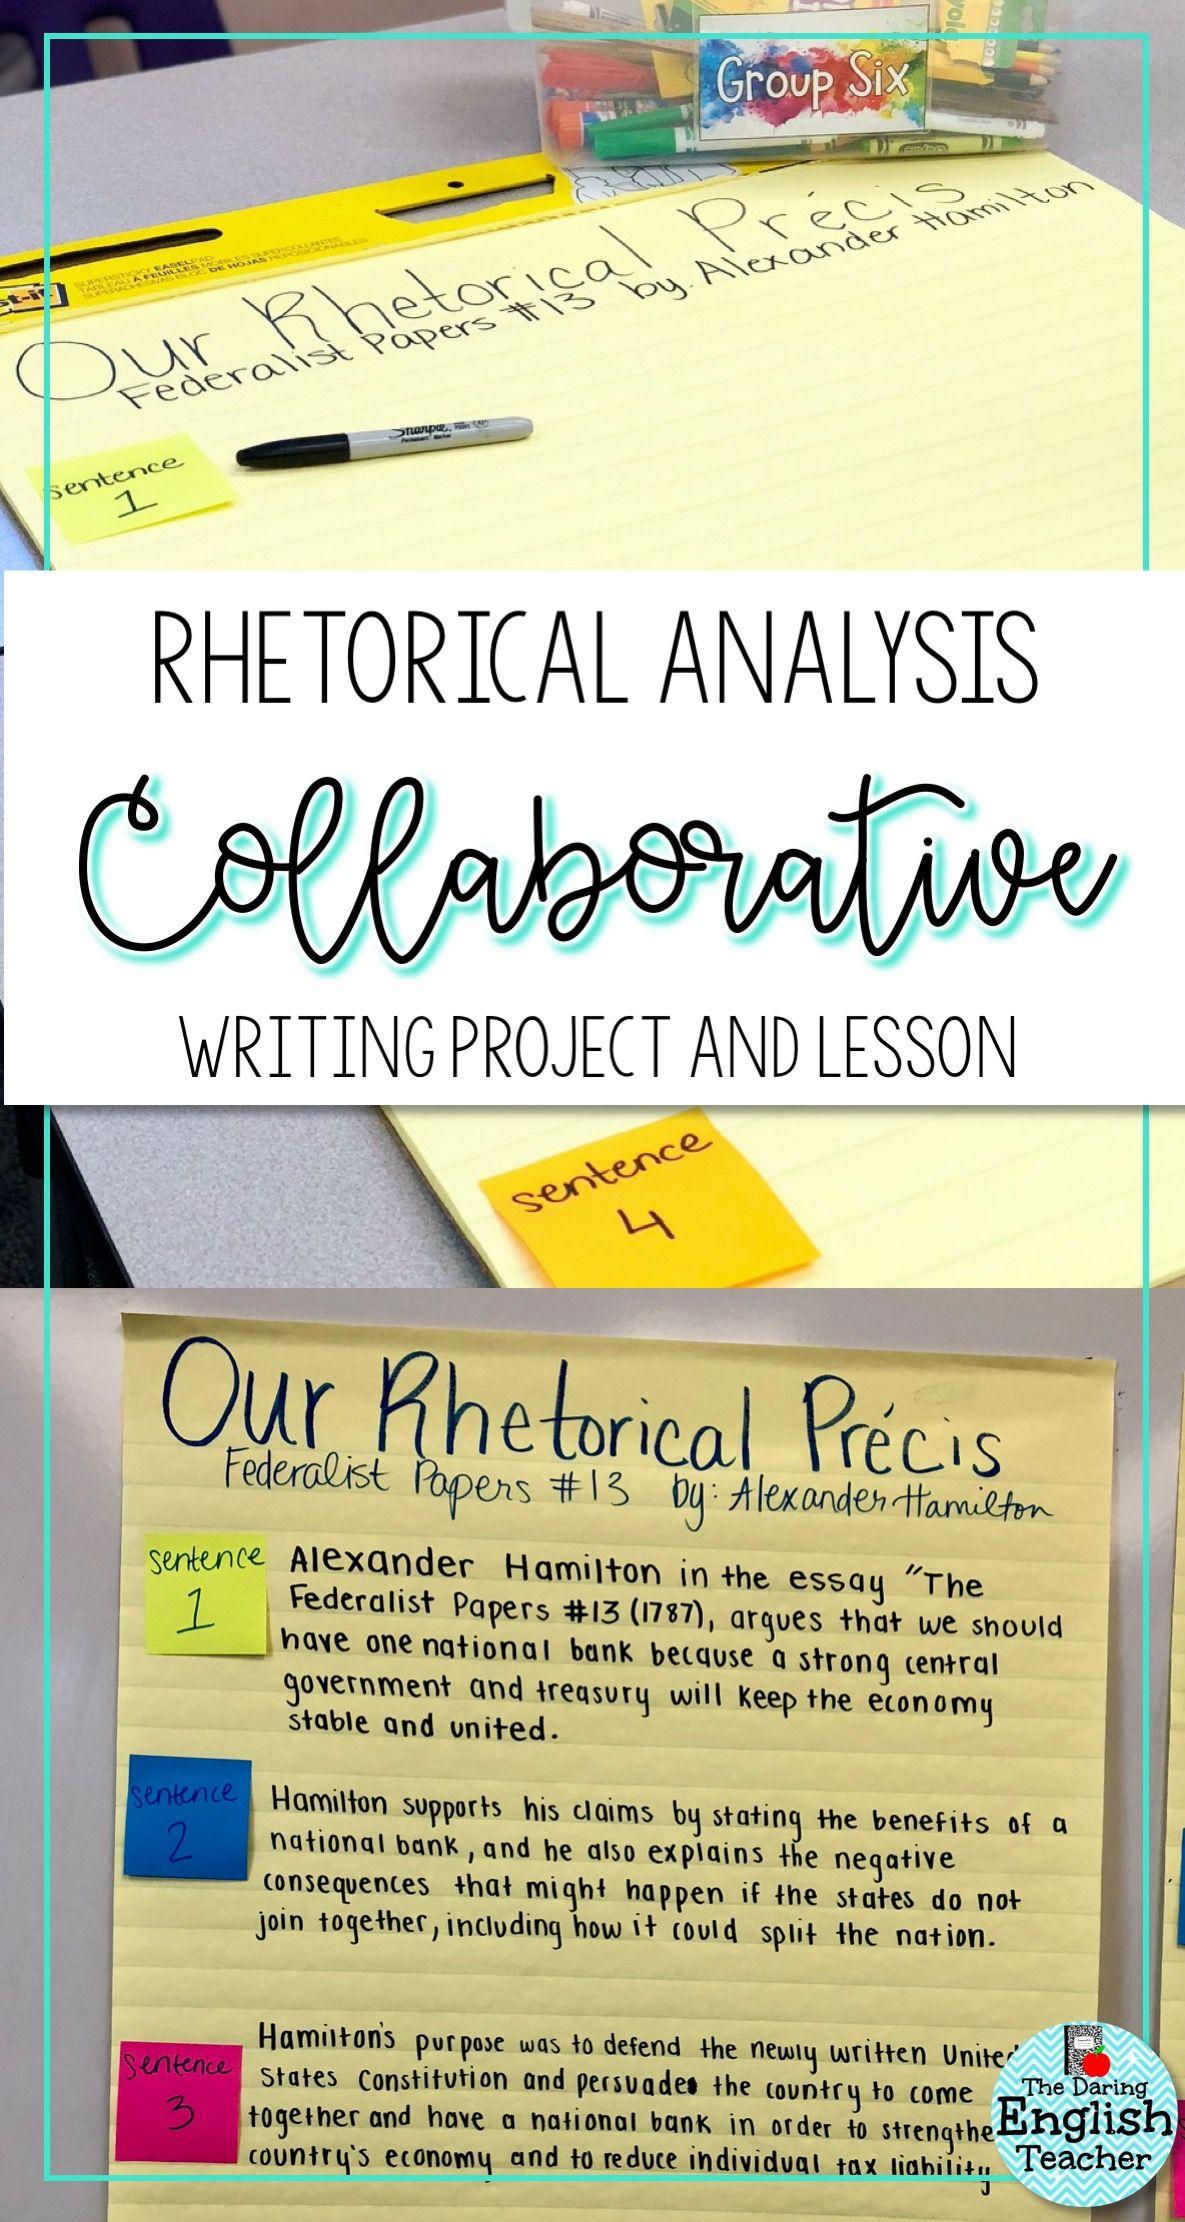 Writing A Class Collaborative Precis Rhetorical Analysis Teaching High Schools Teaching High School English [ 2222 x 1185 Pixel ]